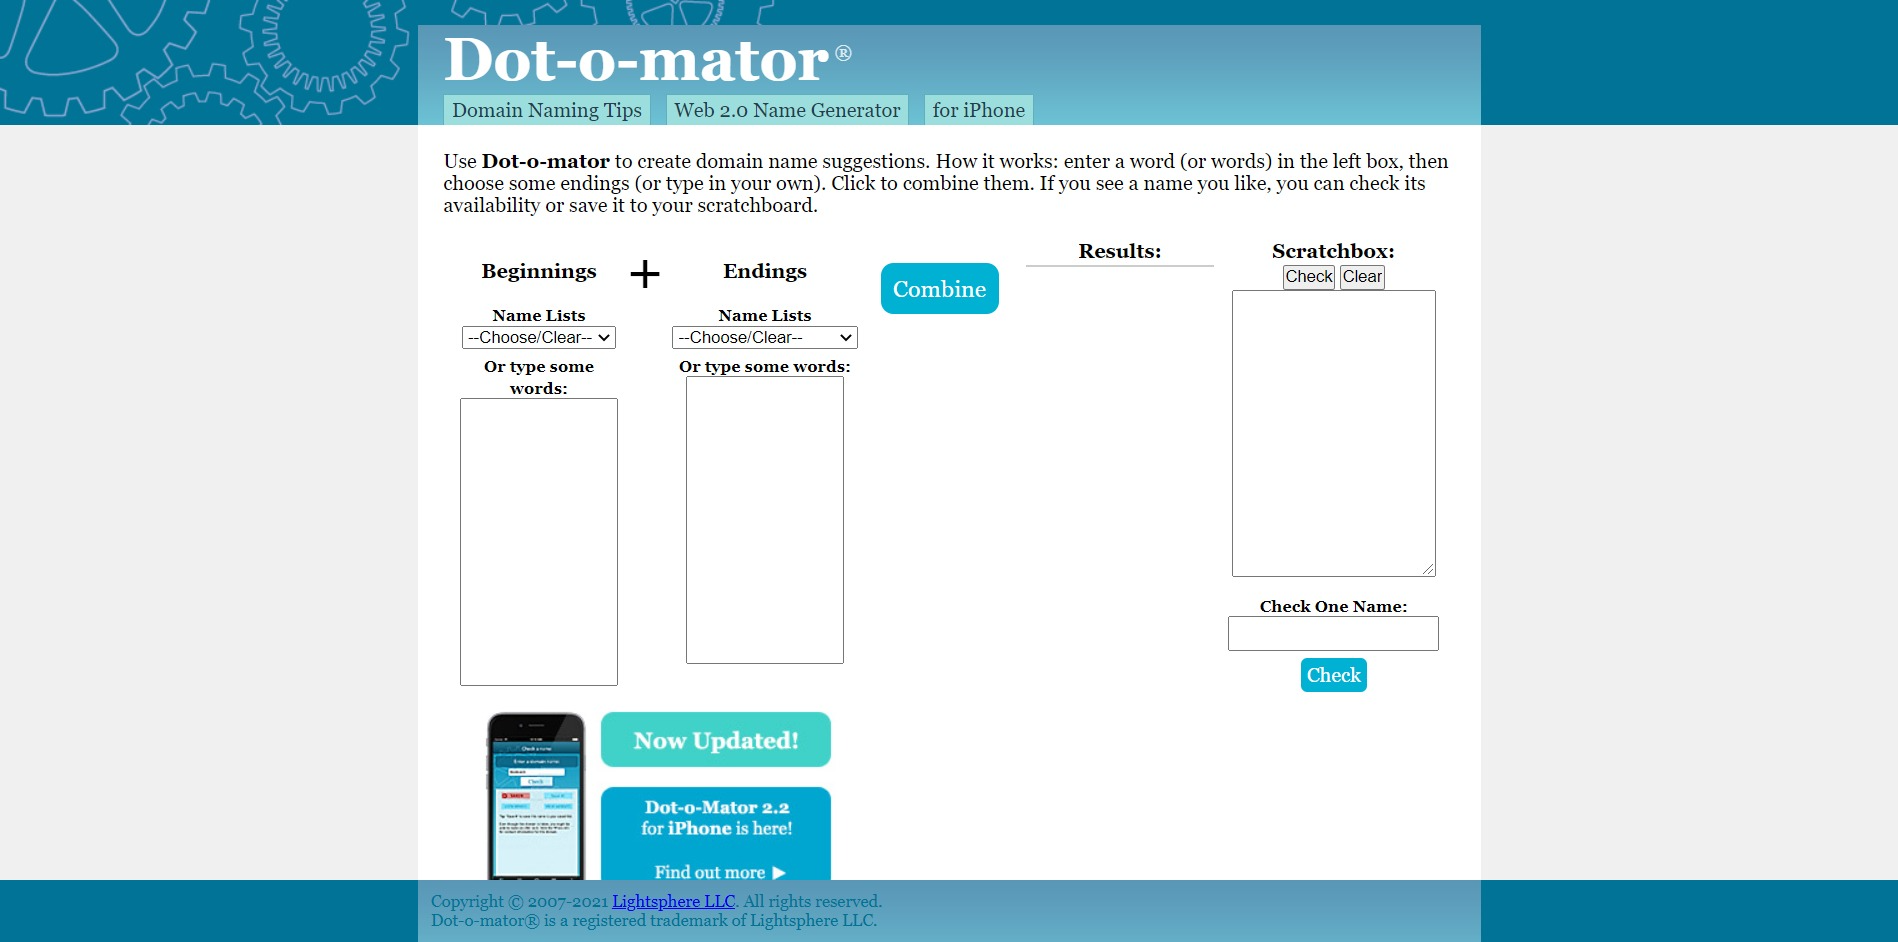 Dot-o-mator Domain Name Generator